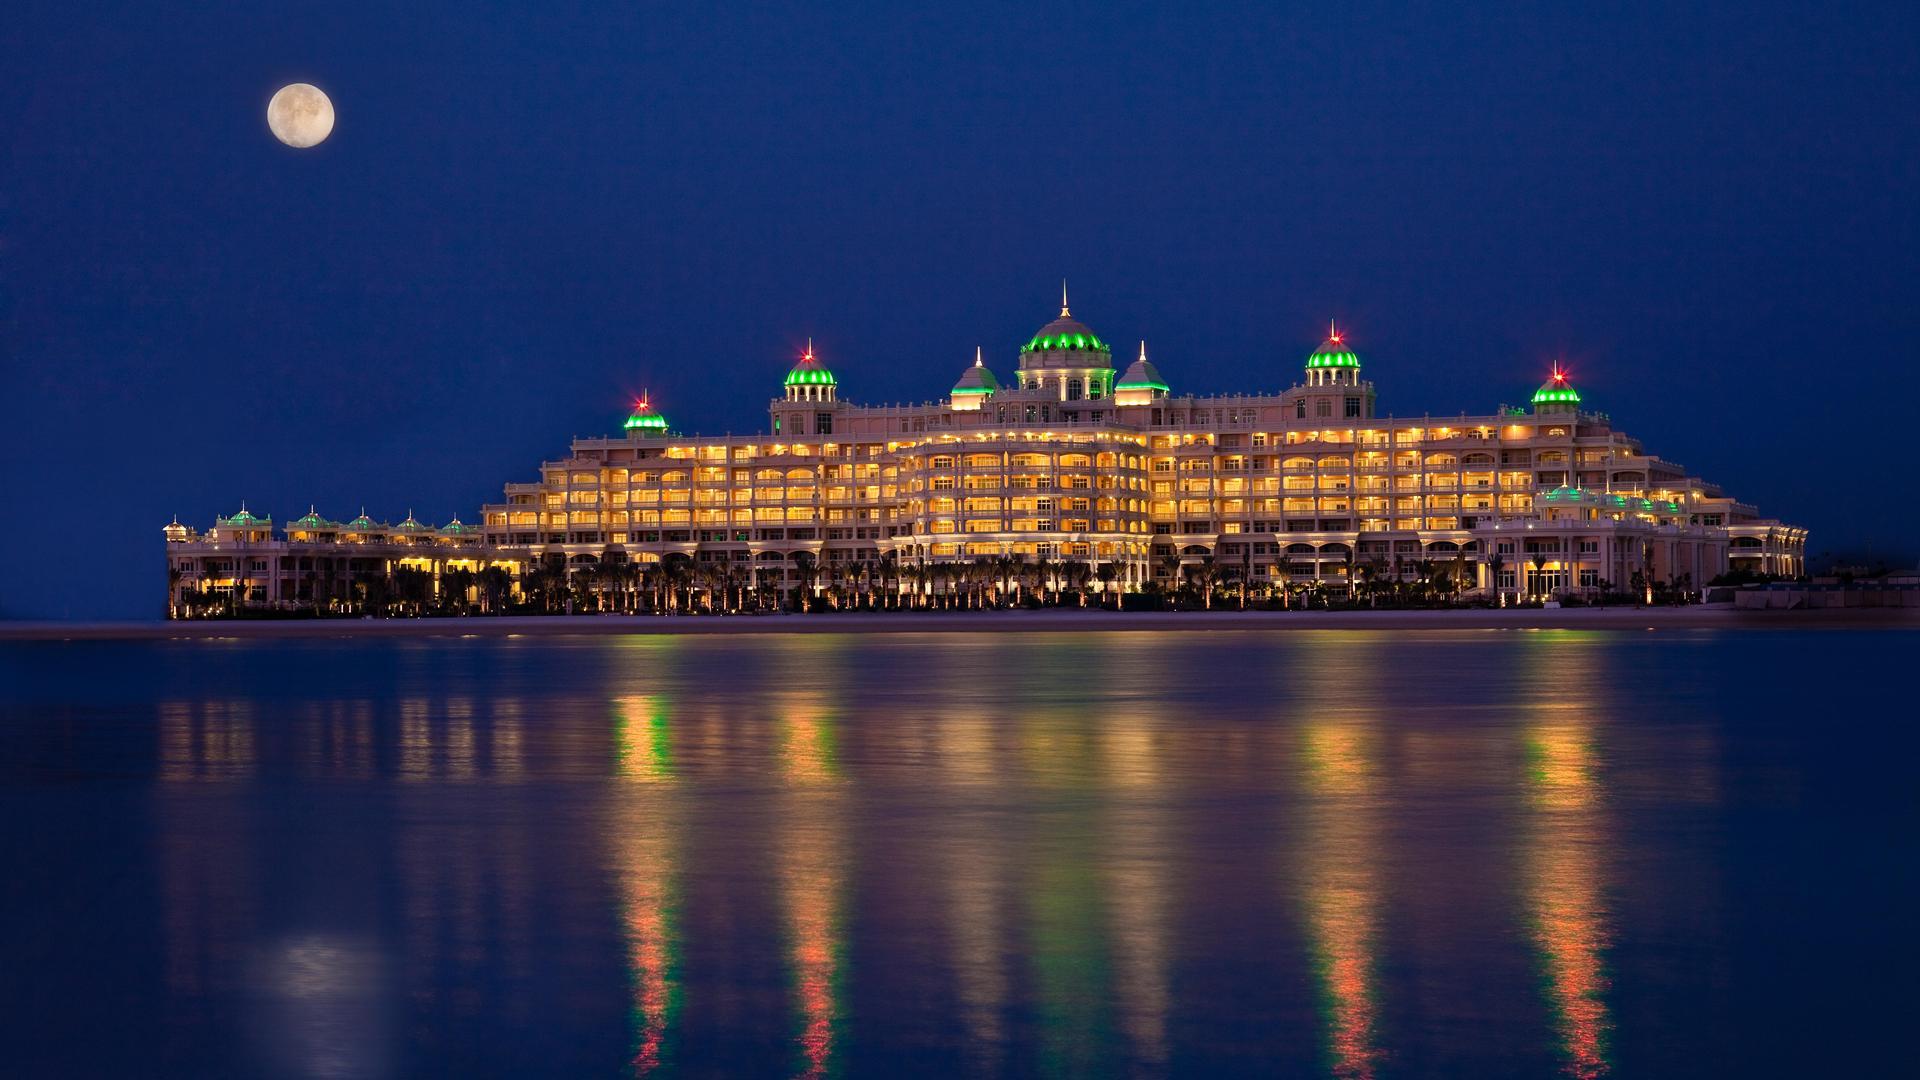 Kempinski Hotel & Spa / Palm Jumeirah, Dubai